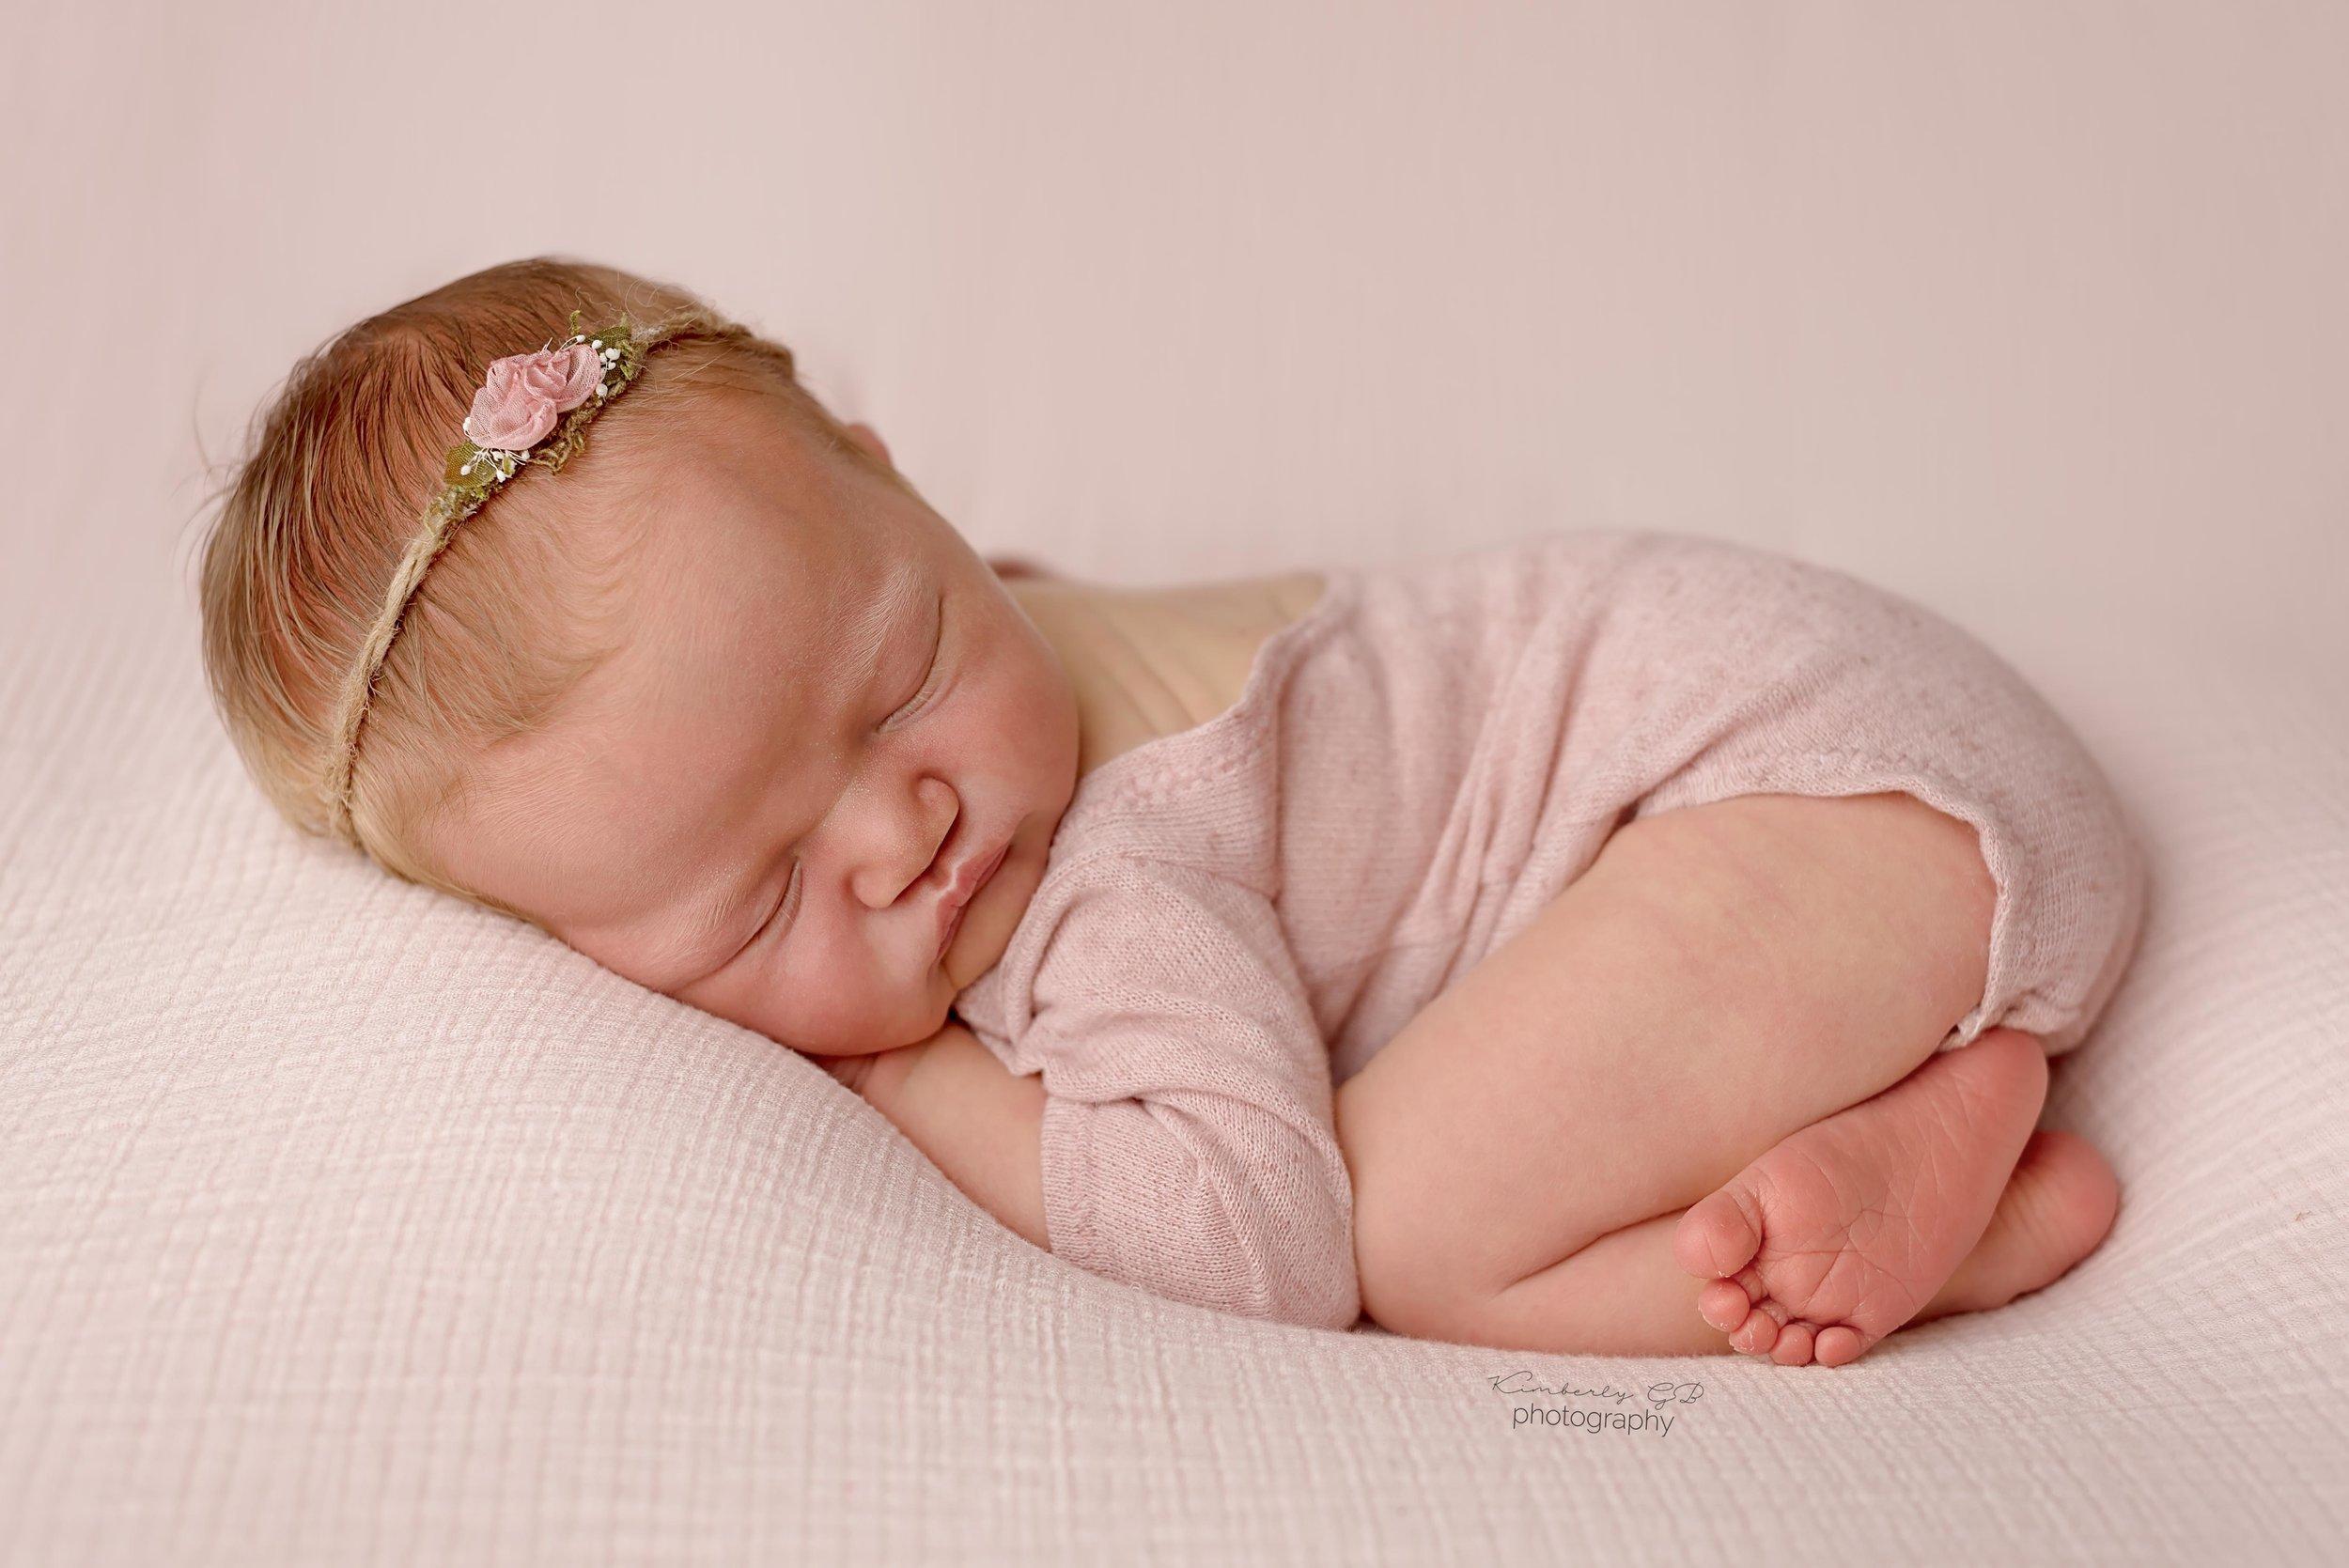 fotografia-de-recien-nacidos-bebes-newborn-en-puerto-rico-kimberly-gb-photography-fotografa-172.jpg